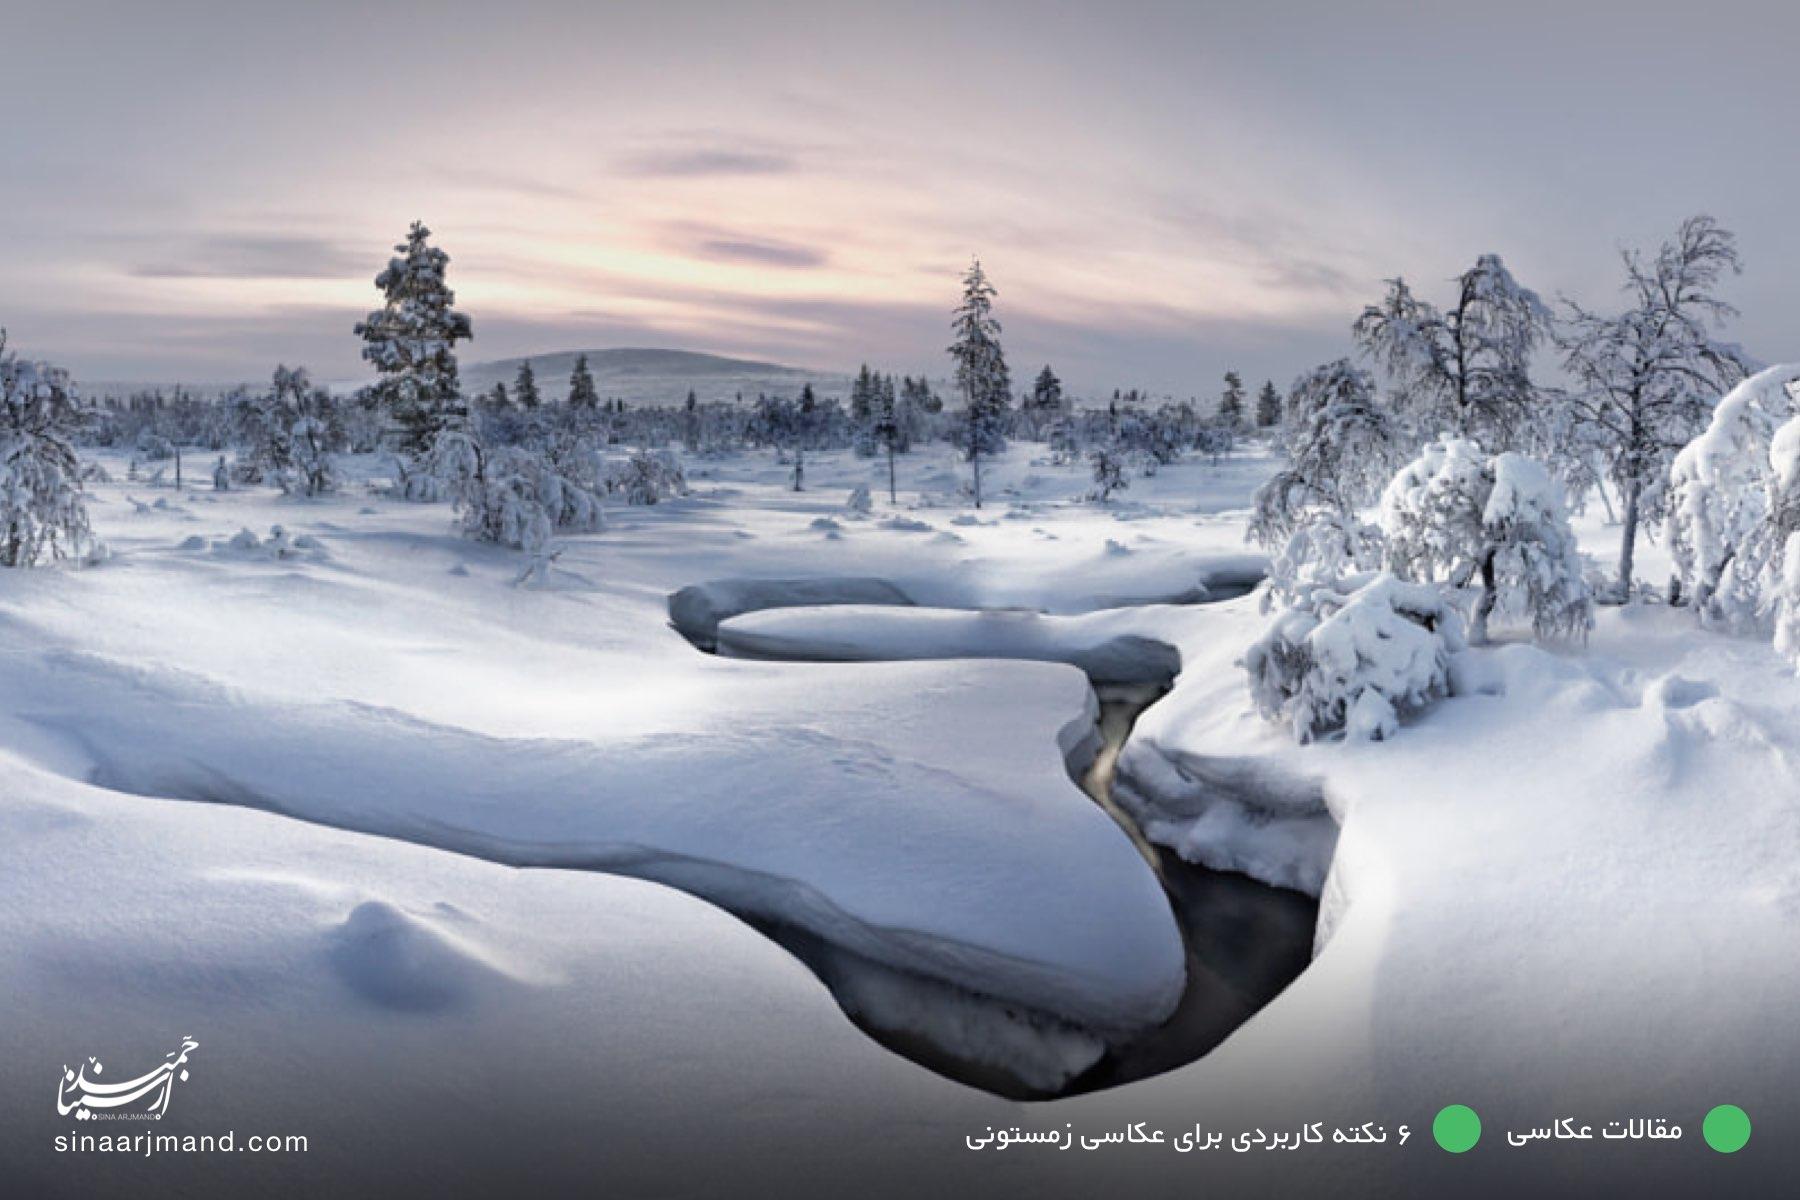 Lapland - Kiilopää by Christian Schweiger on 500px.com